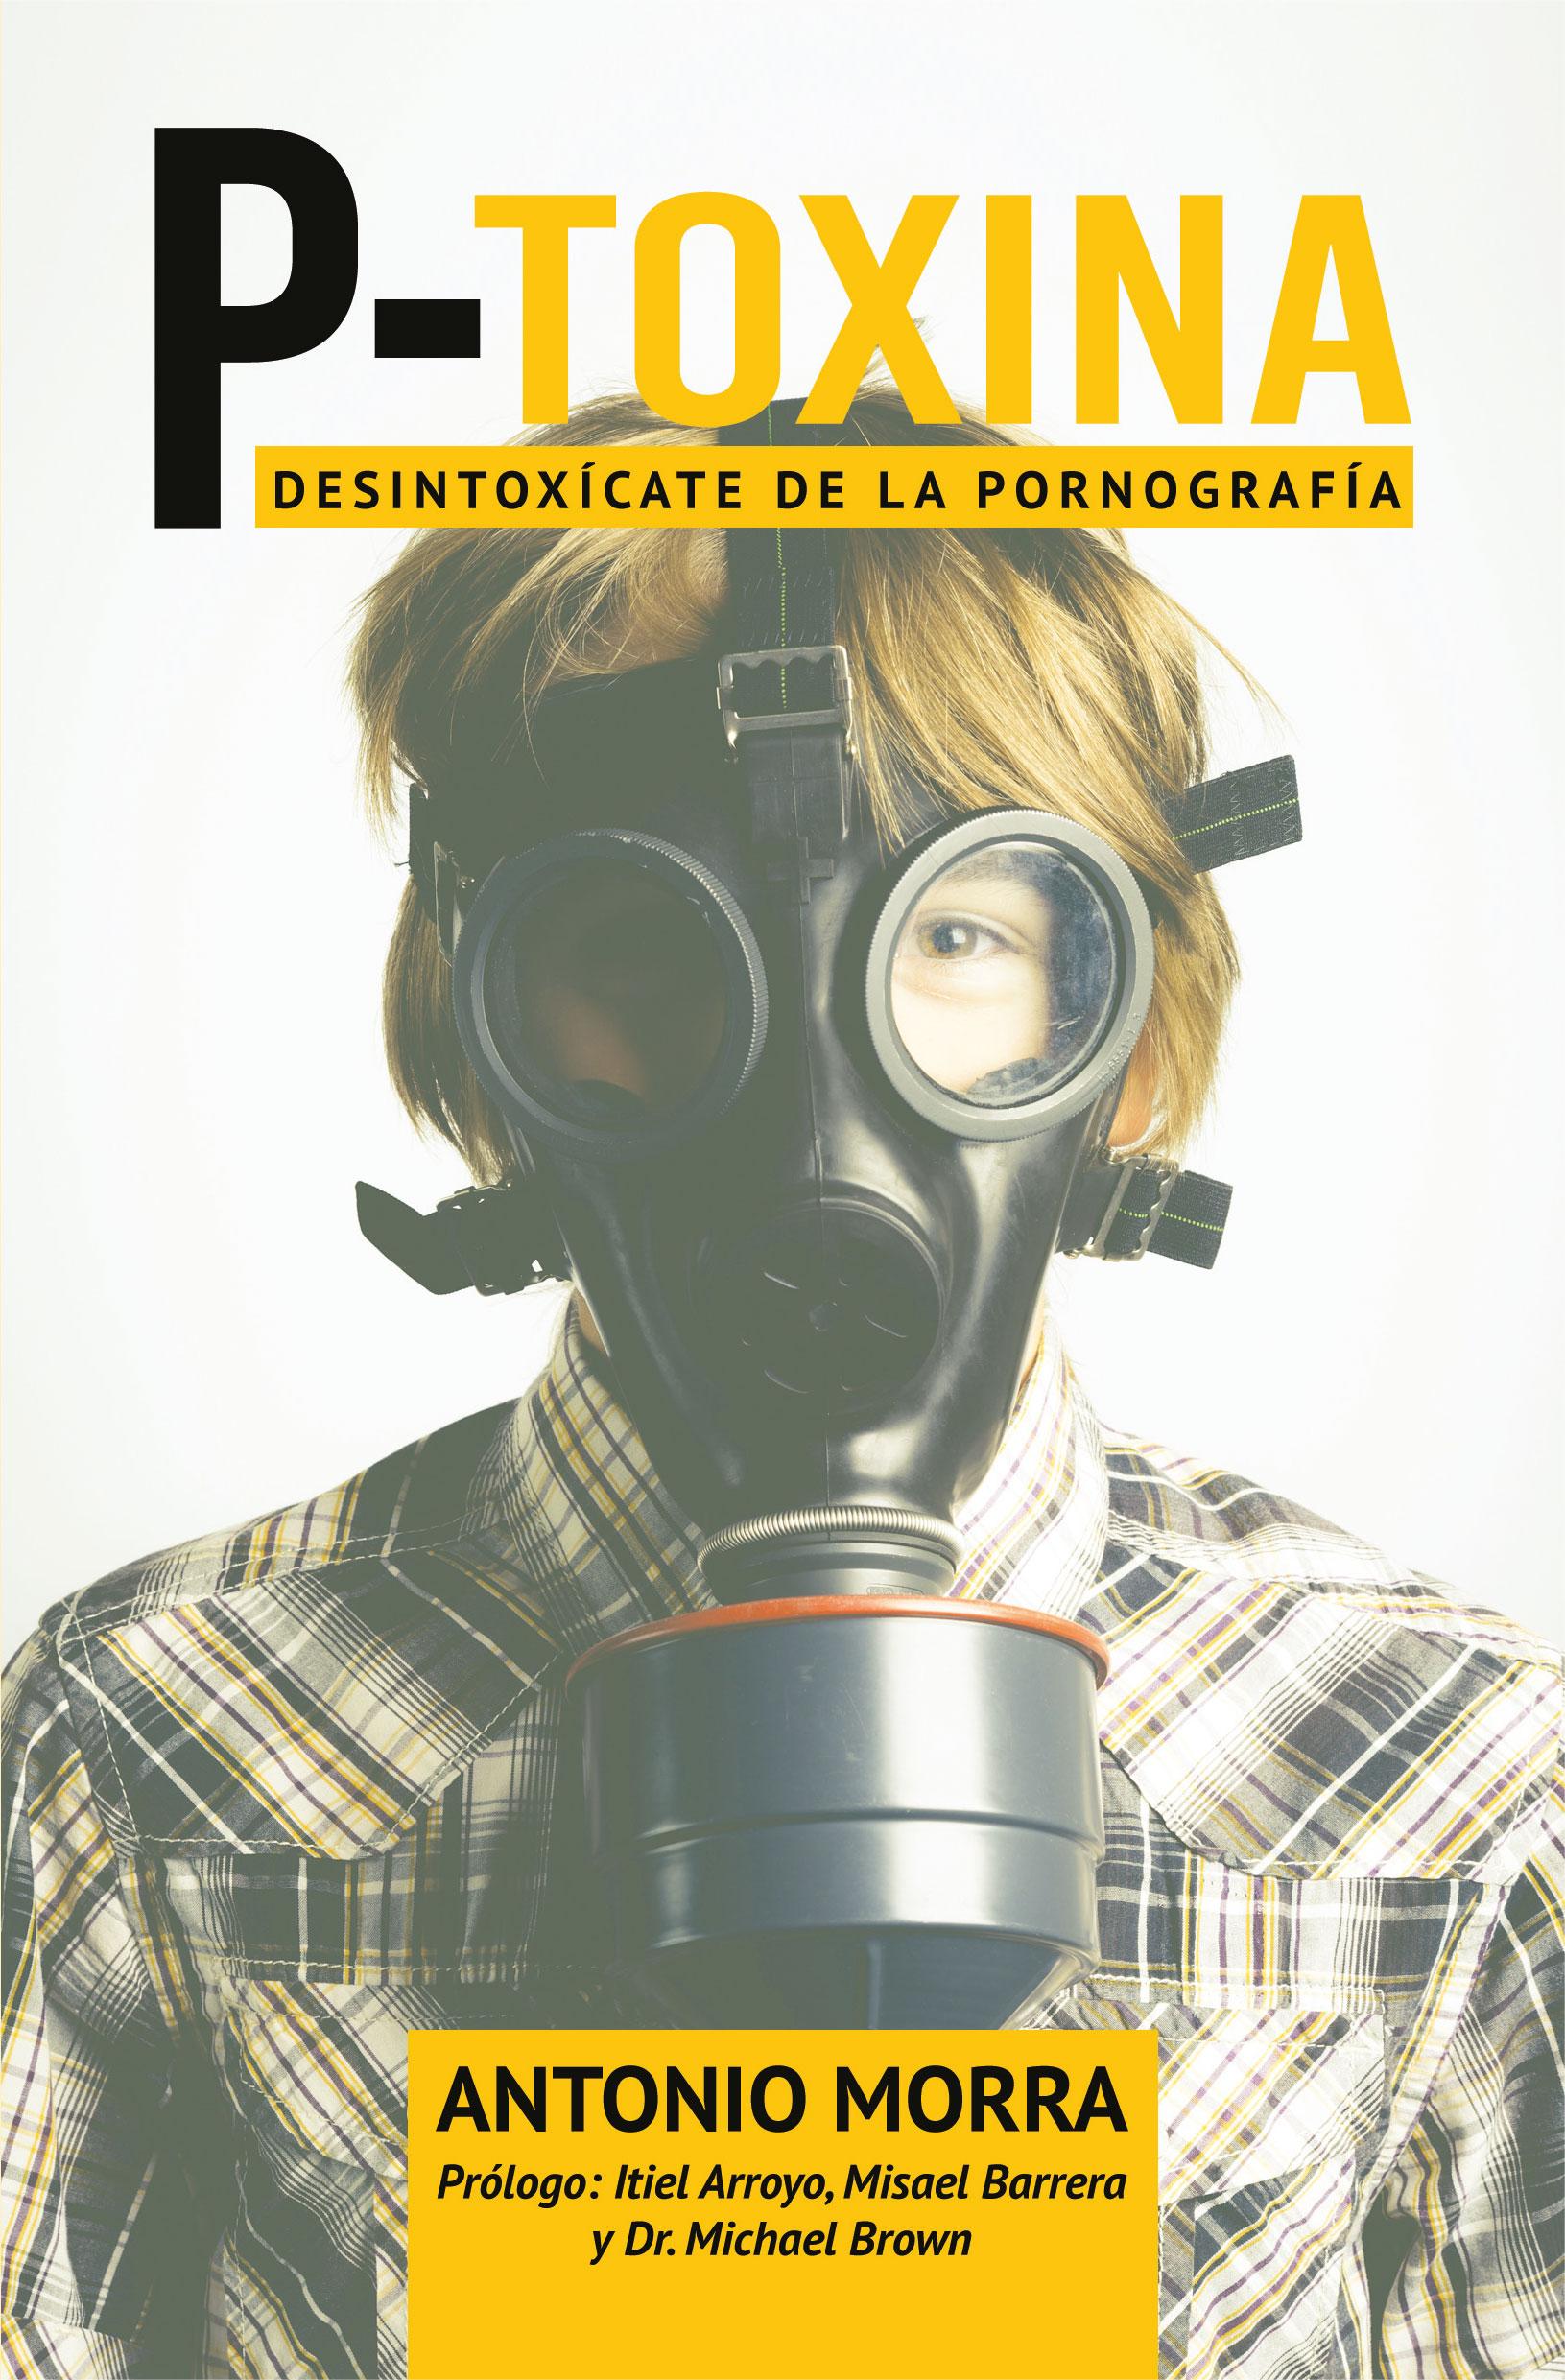 P-Toxina /Desintoxicate De La Pornografia